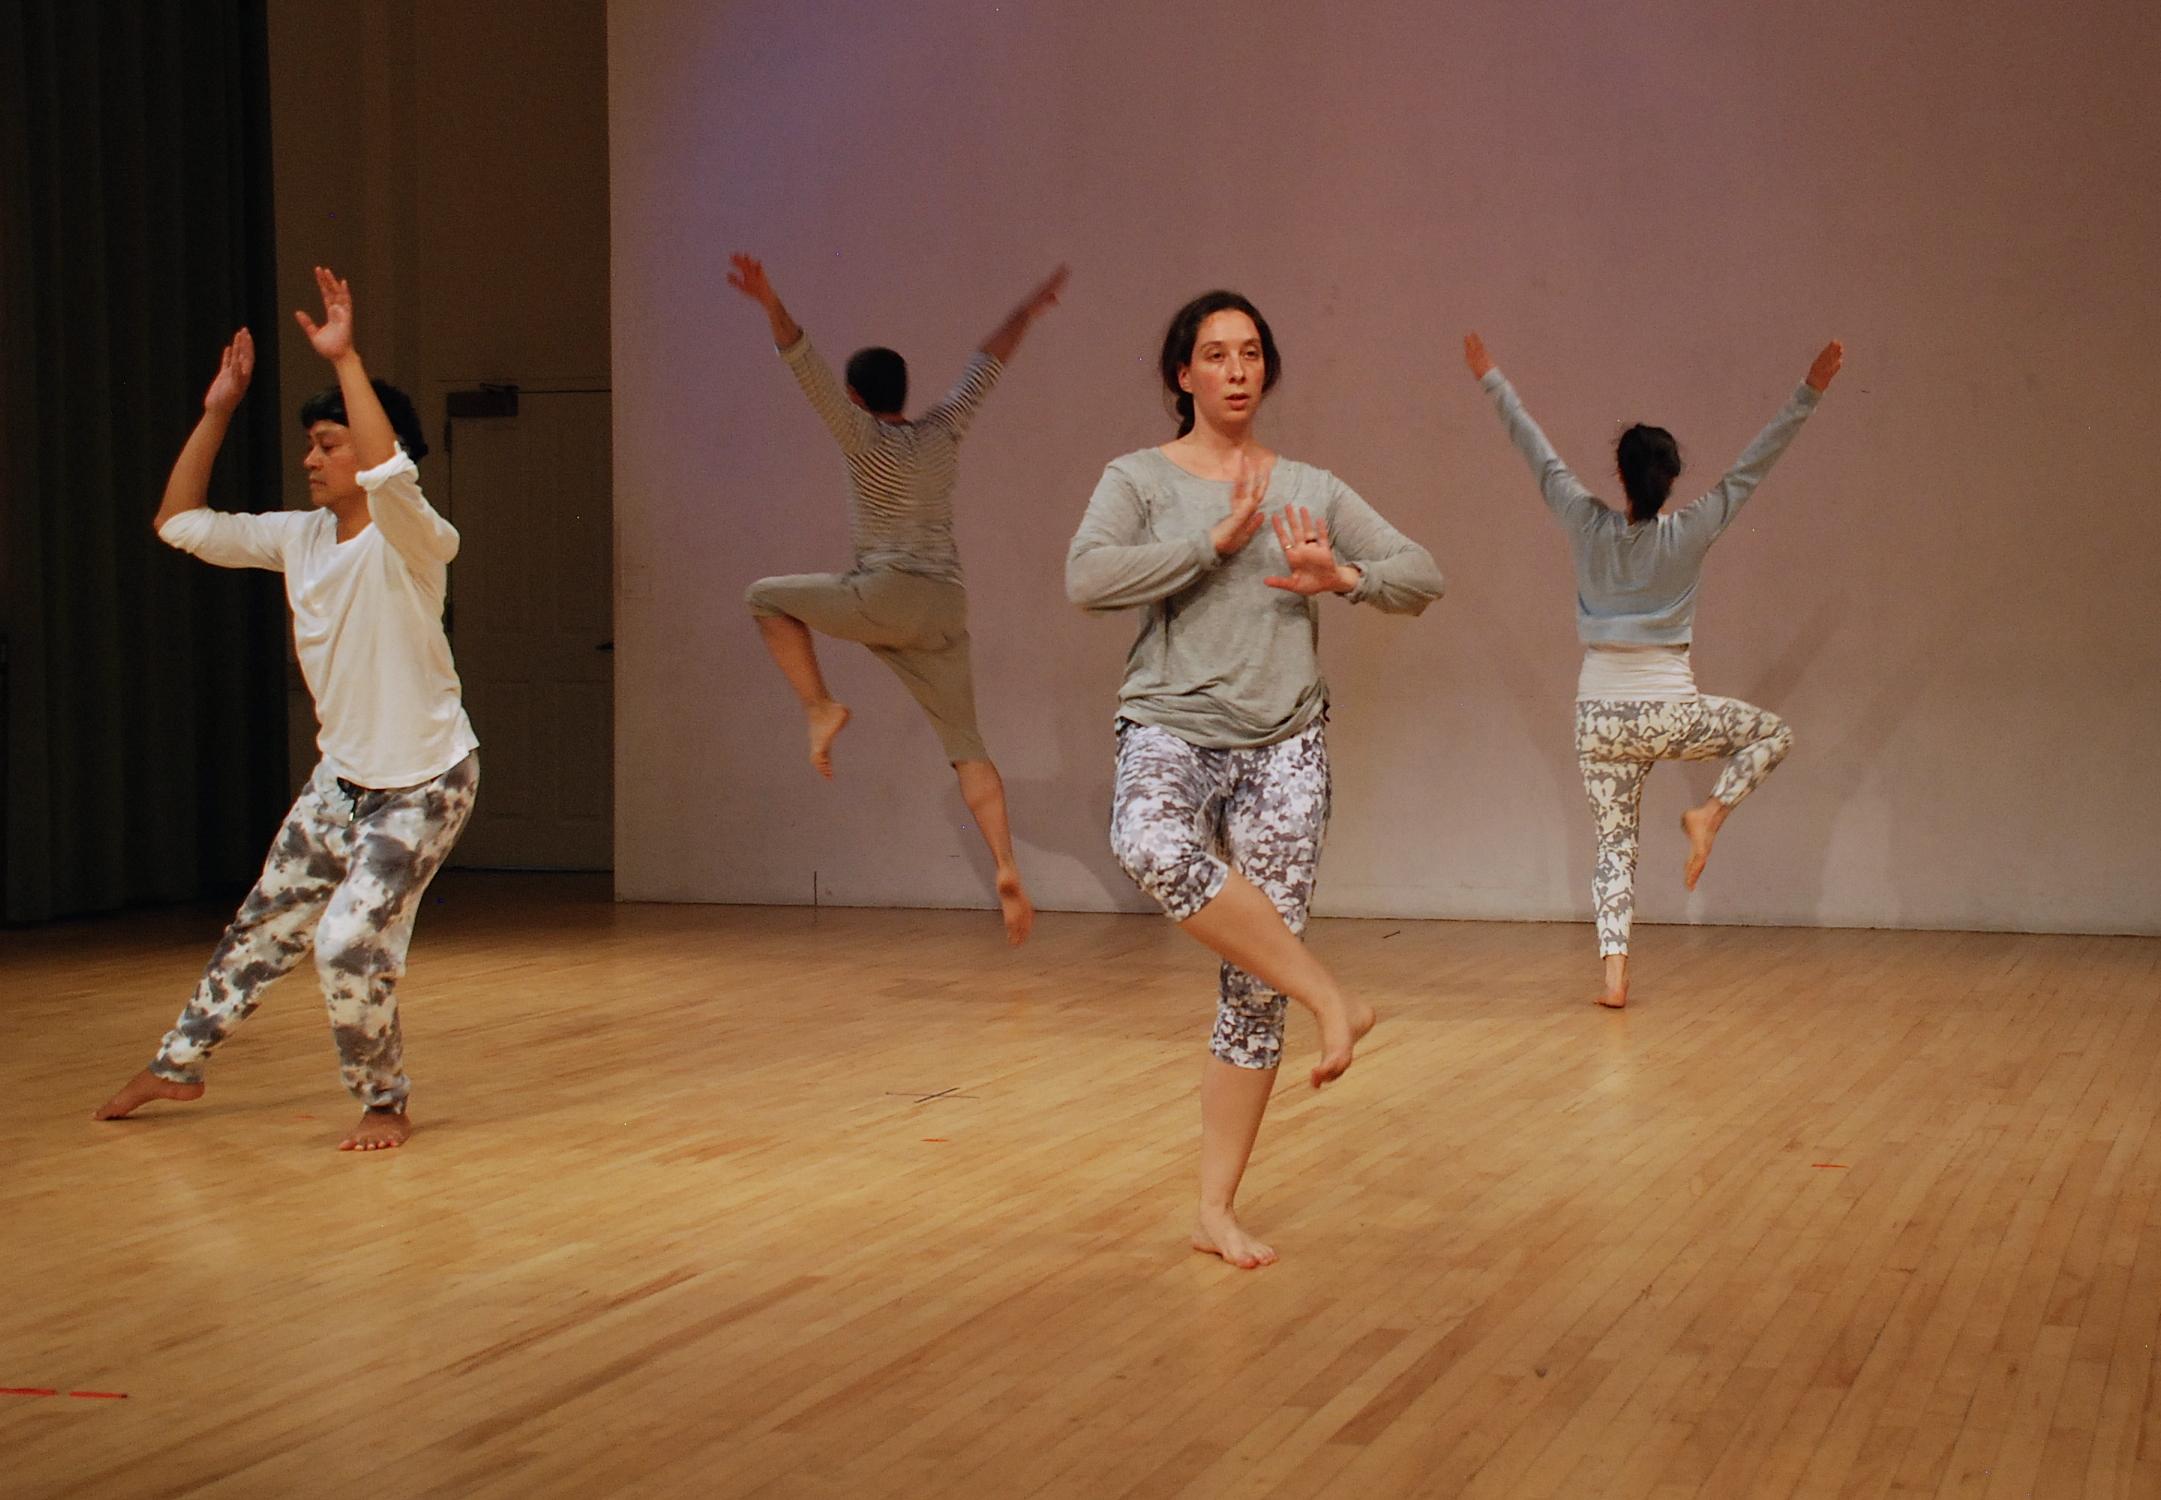 Annie Sailer Dance Company performing 'architecture of forgiveness' at Spyer Hall,University Settlement, NYC. 2015  Photo: Scott Tedman-Jones Dancers (L-R): Rod Rufo, Ty Tedman-Jones, Susan Golub, Heather Meagher